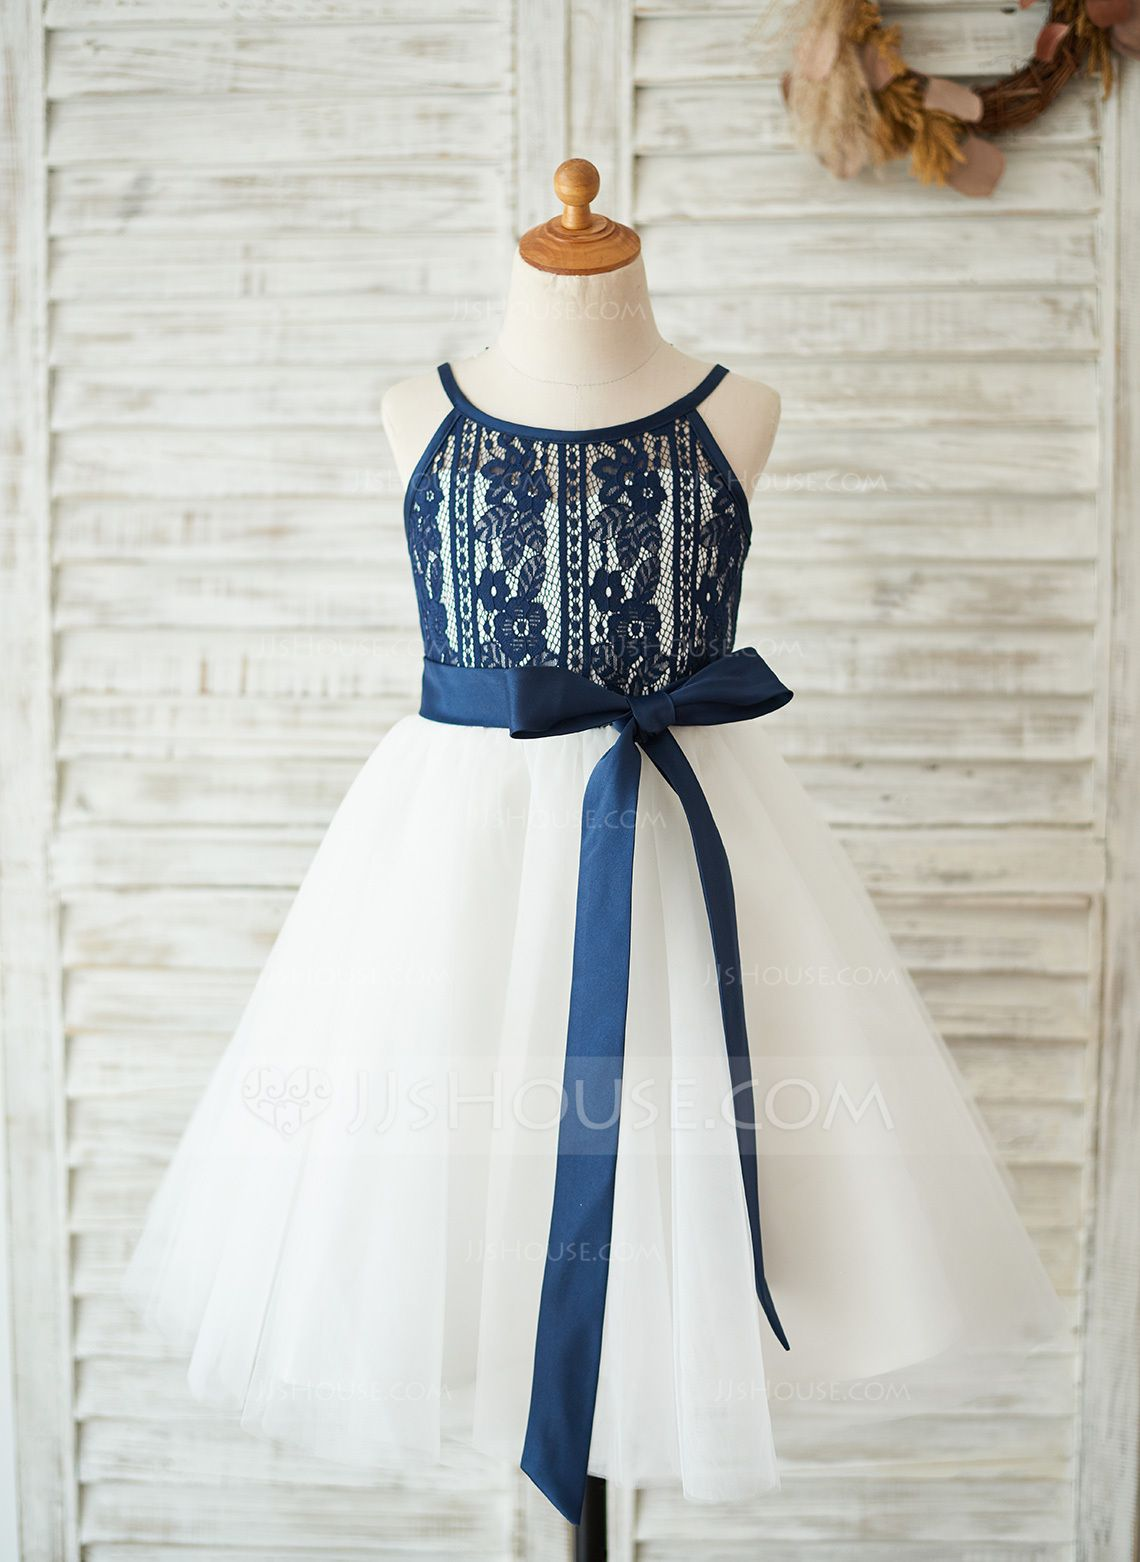 4aab49184 A-Line/Princess Knee-length Flower Girl Dress - Tulle/Lace Sleeveless